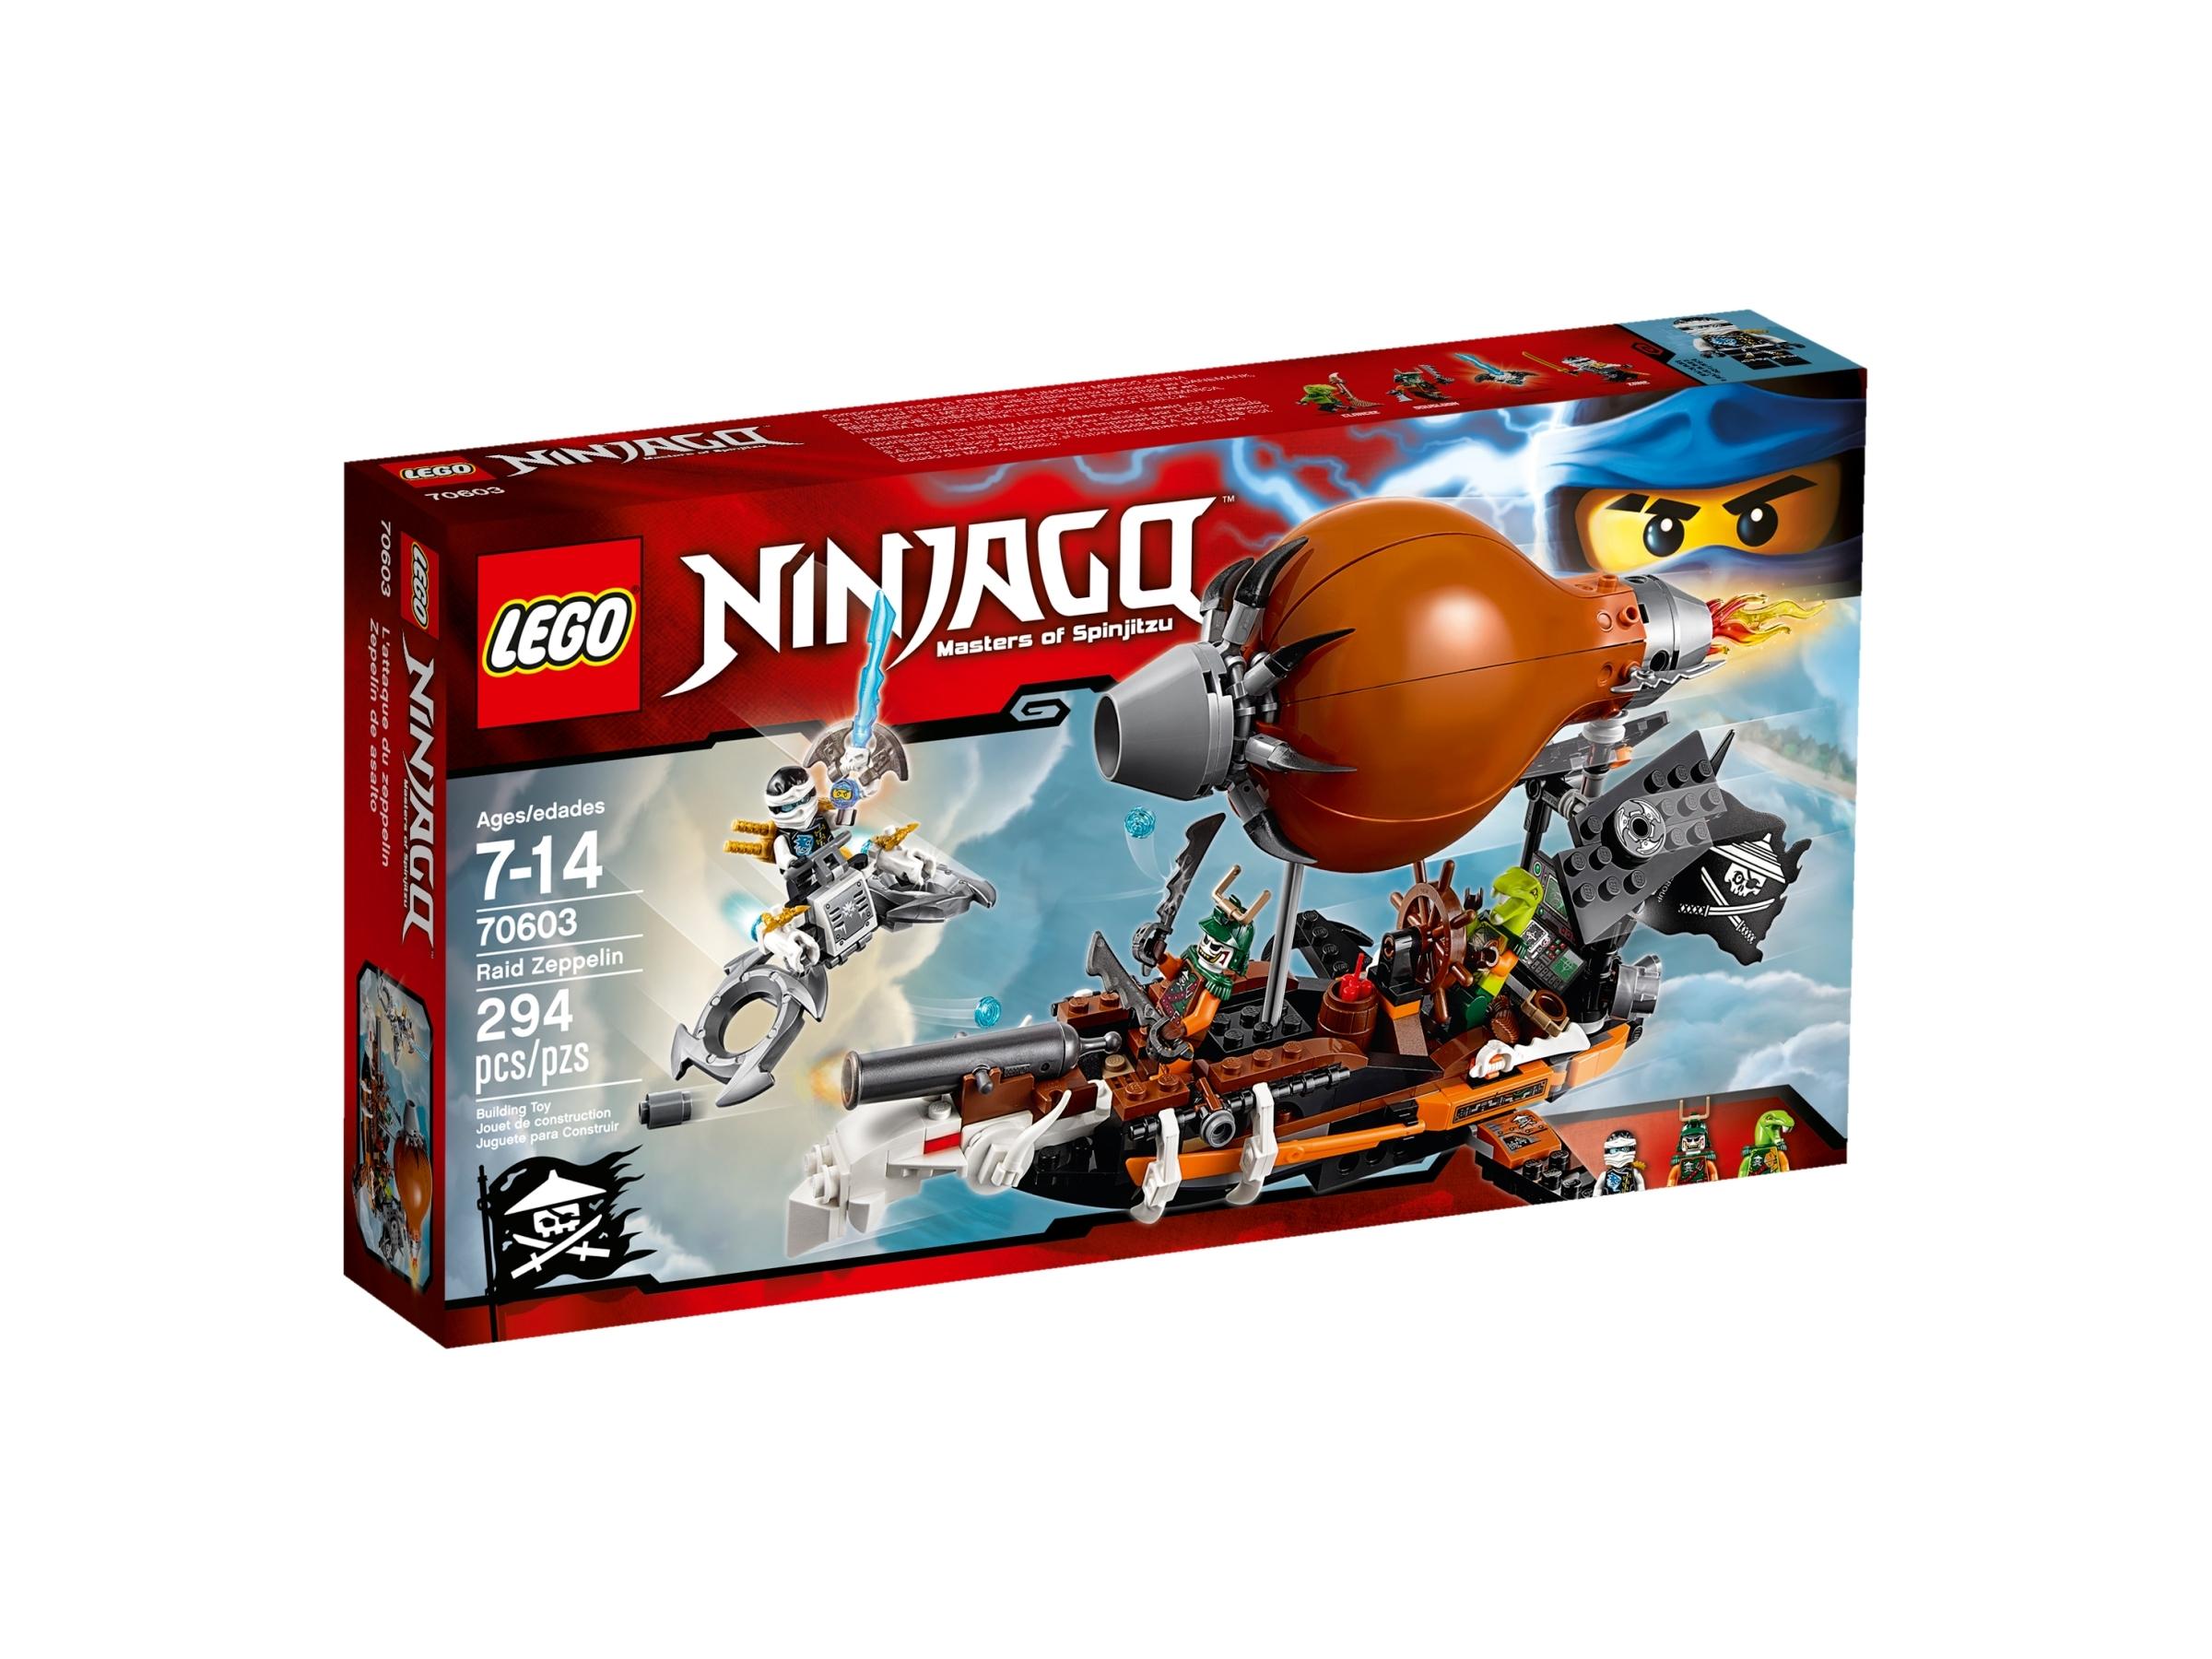 LEGO 70603 Ninjago Raid Zeppelin Skybound Sky Pirate Doubloon Minifigure